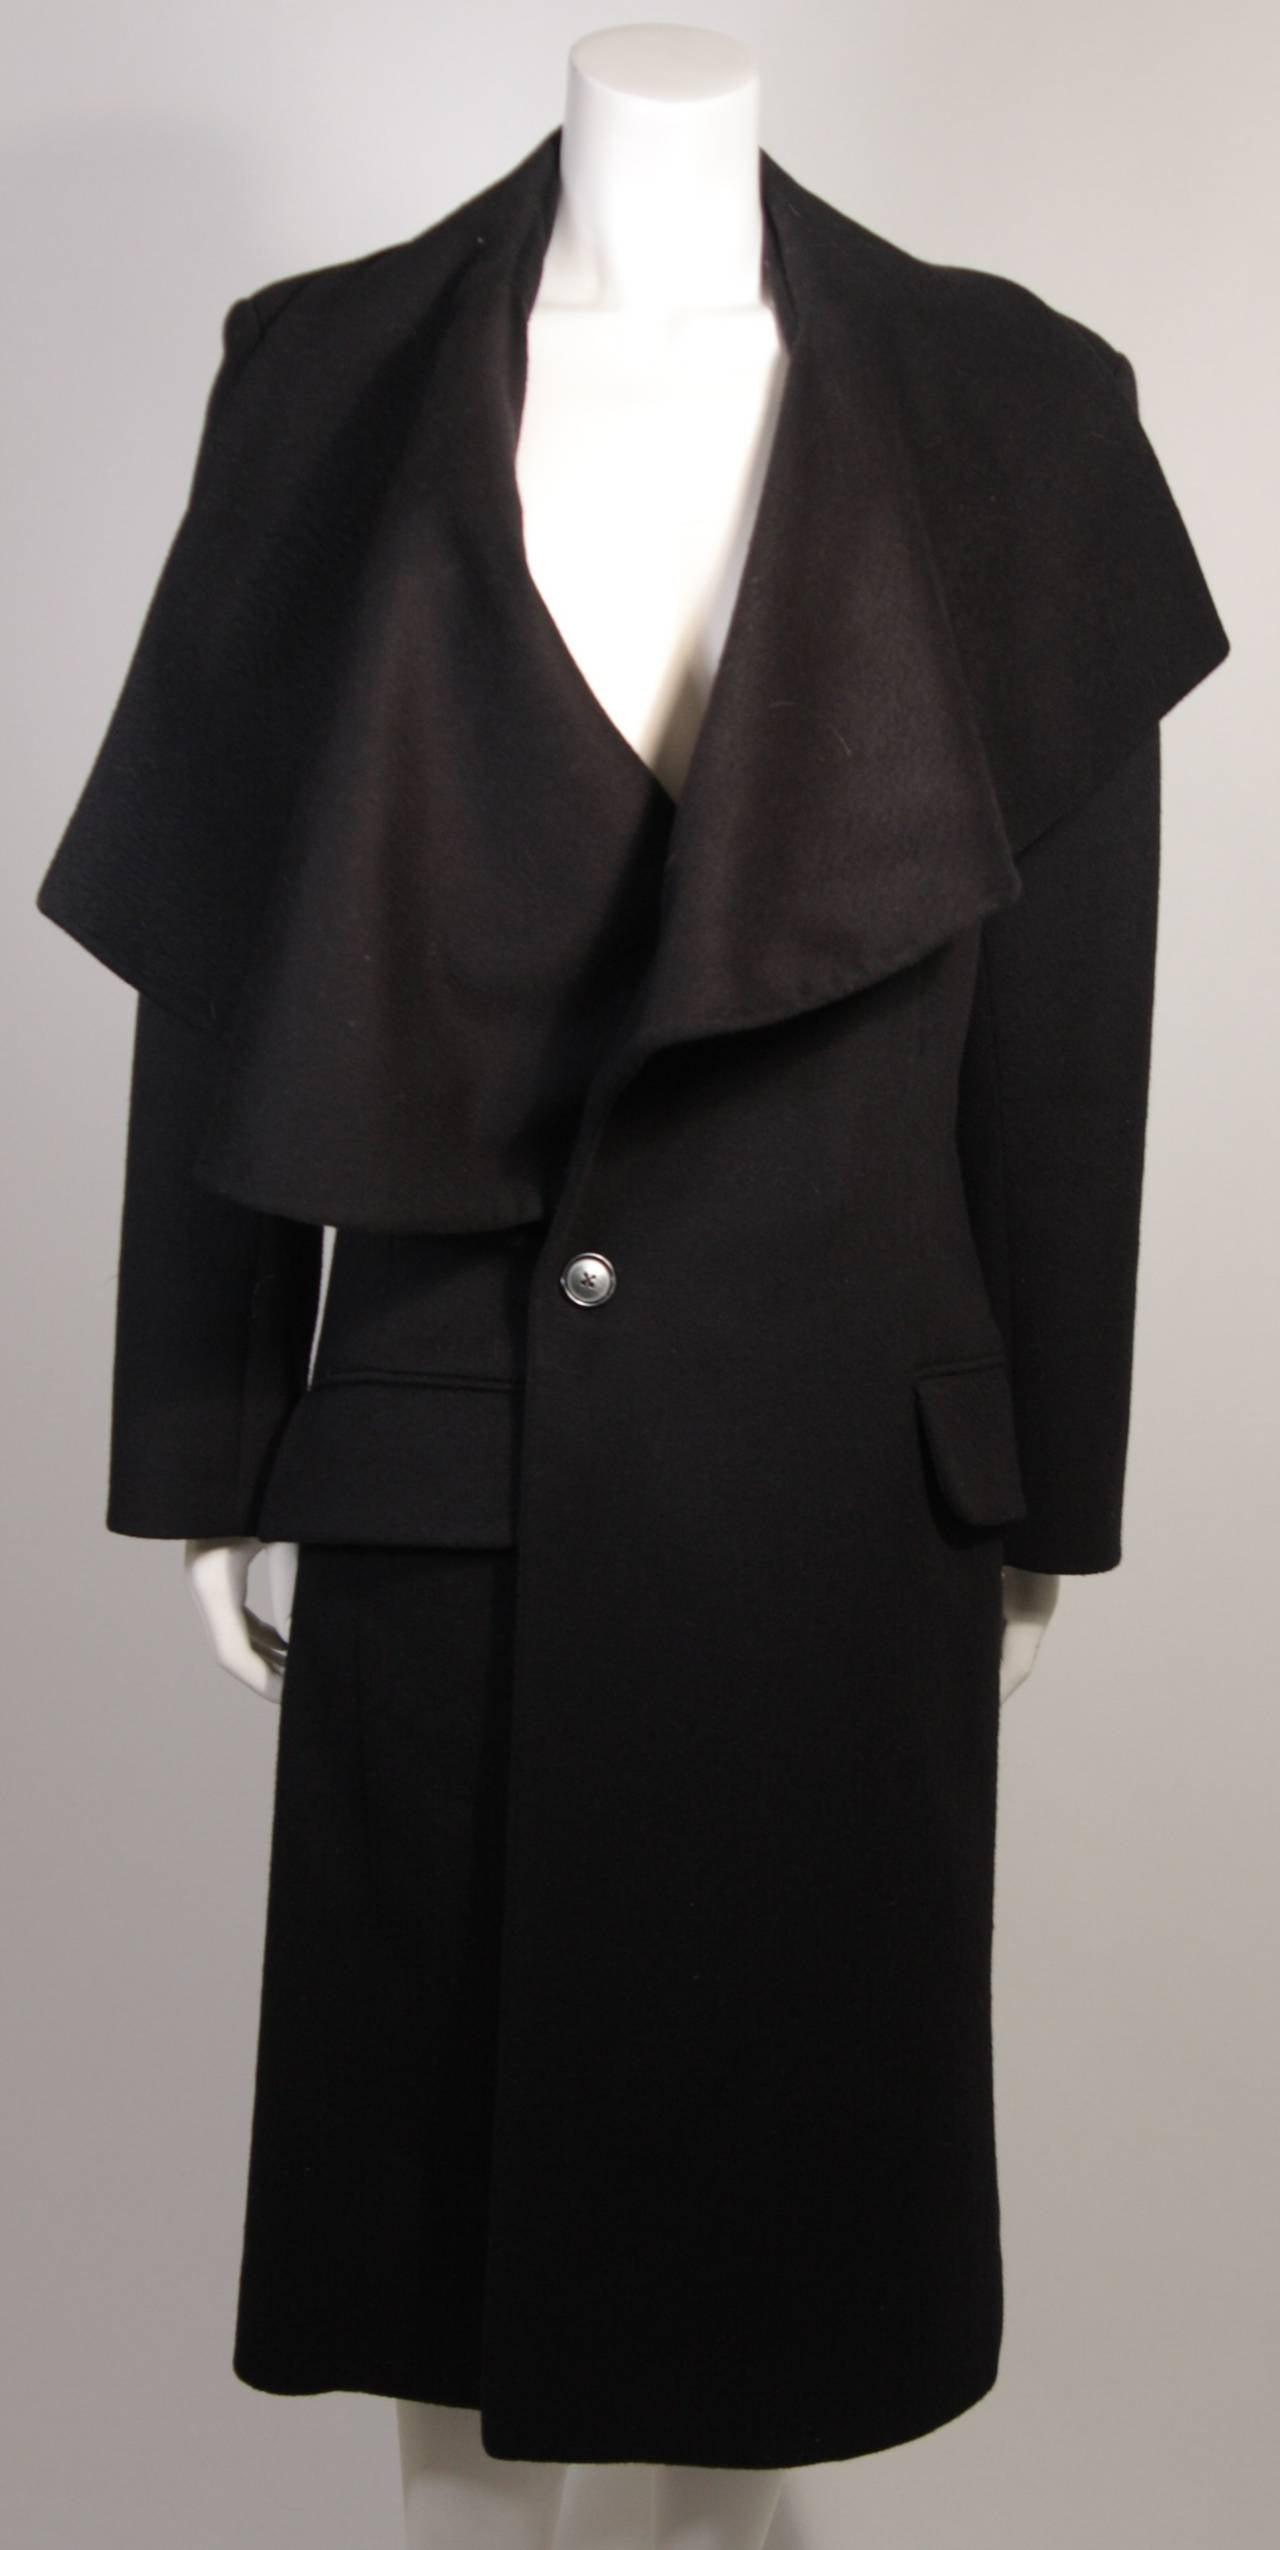 Black John Galliano Over-Sized Asymmetrical Collar Coat Size 10 42 For Sale